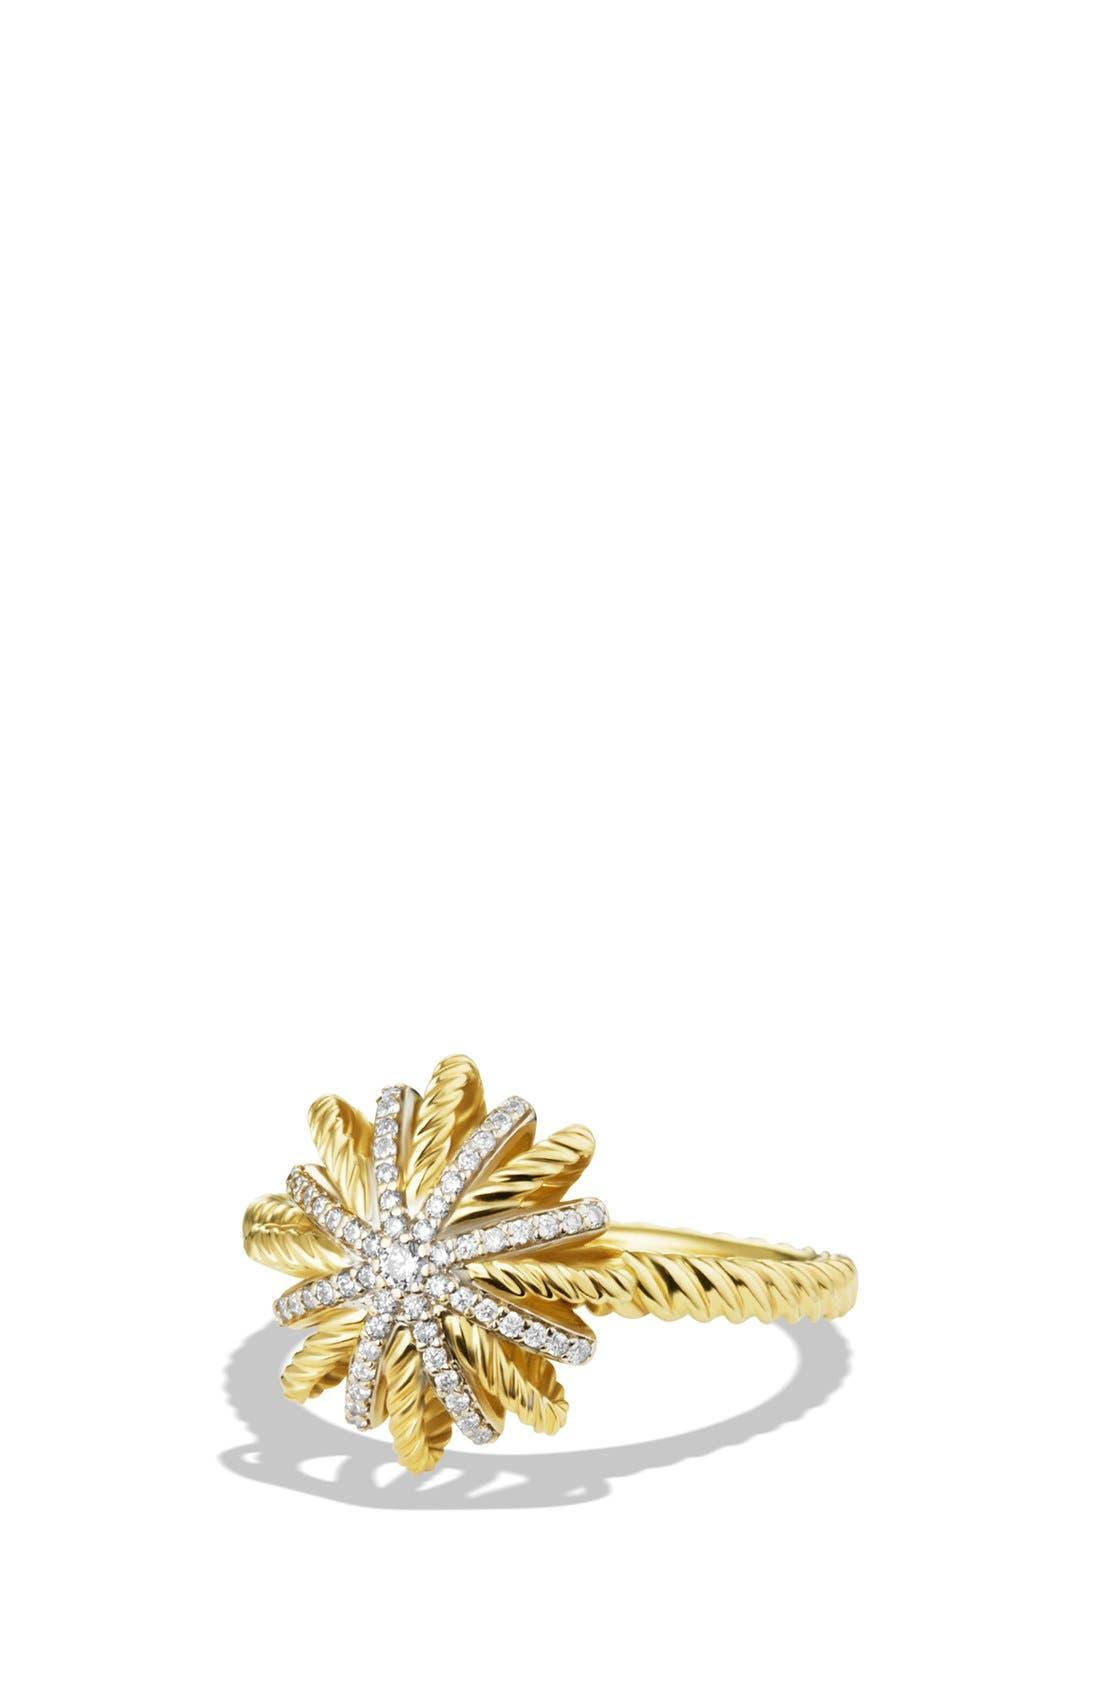 David Yurman 'Starburst' Ring with Diamonds in Gold